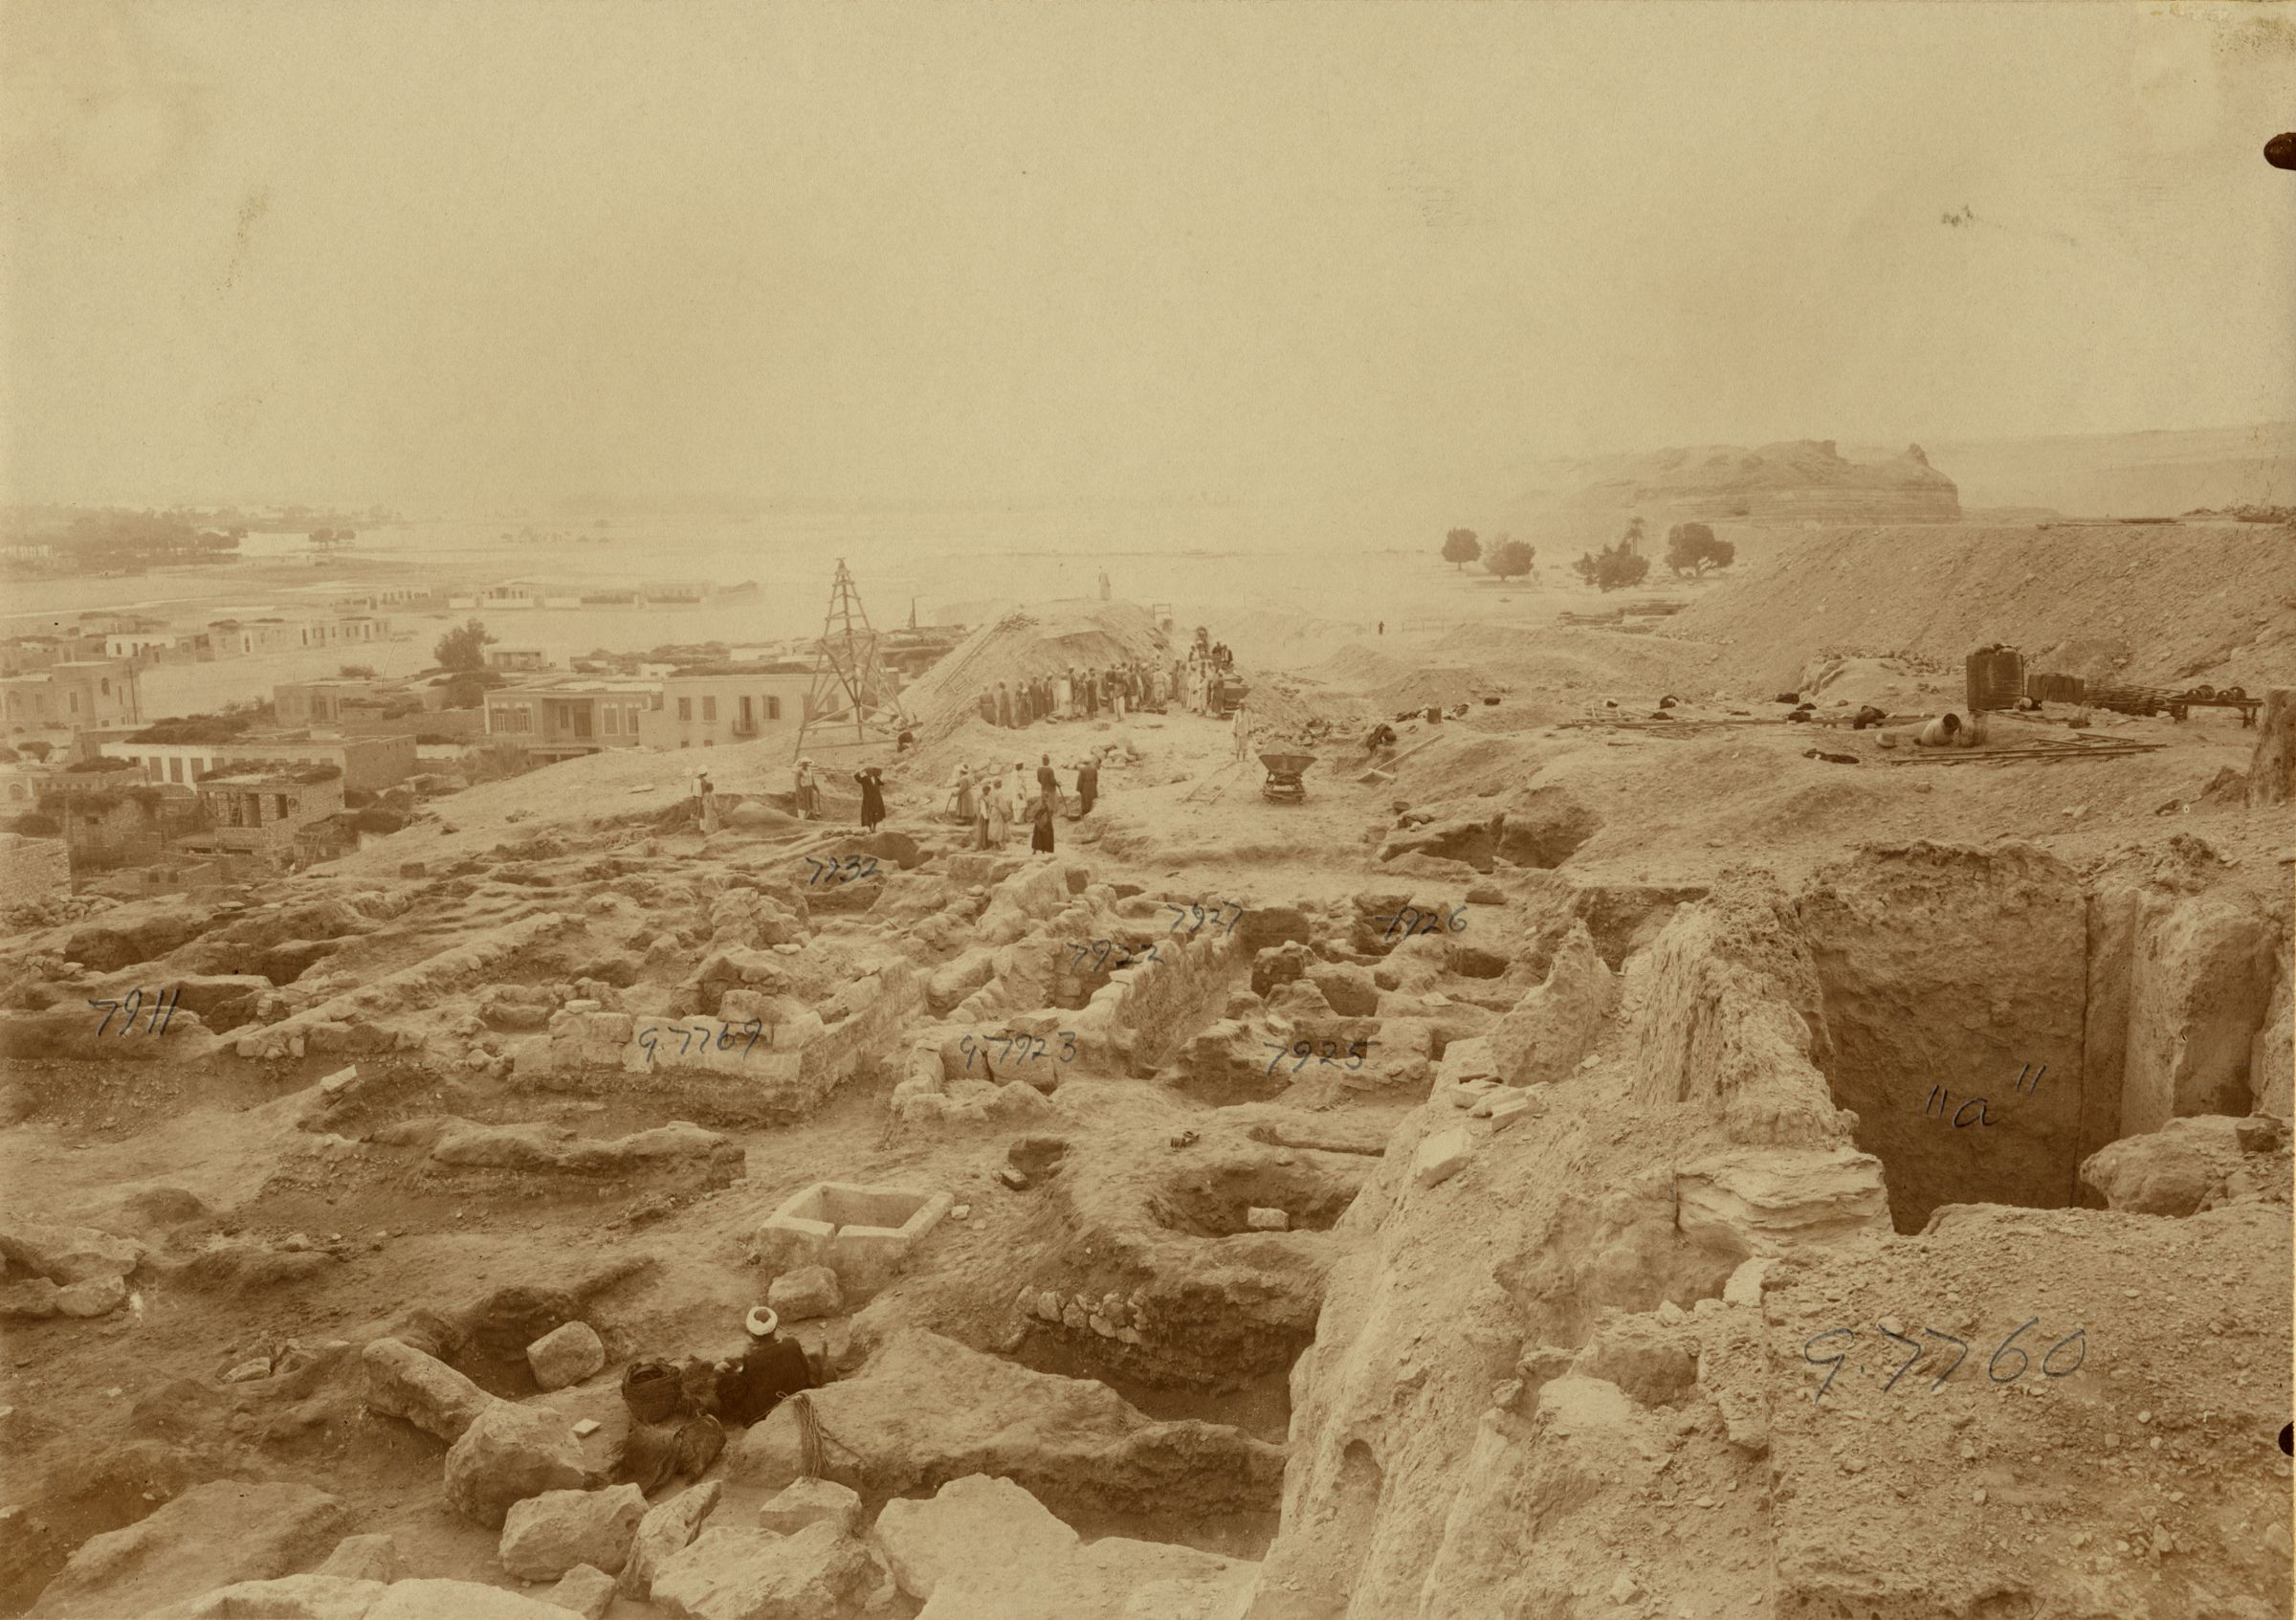 Eastern Cemetery: Site: Giza; View: G 7760, G 7911, G 7769, G 7932, G 7923, G 7922, G 7927, G 7925, G 7926